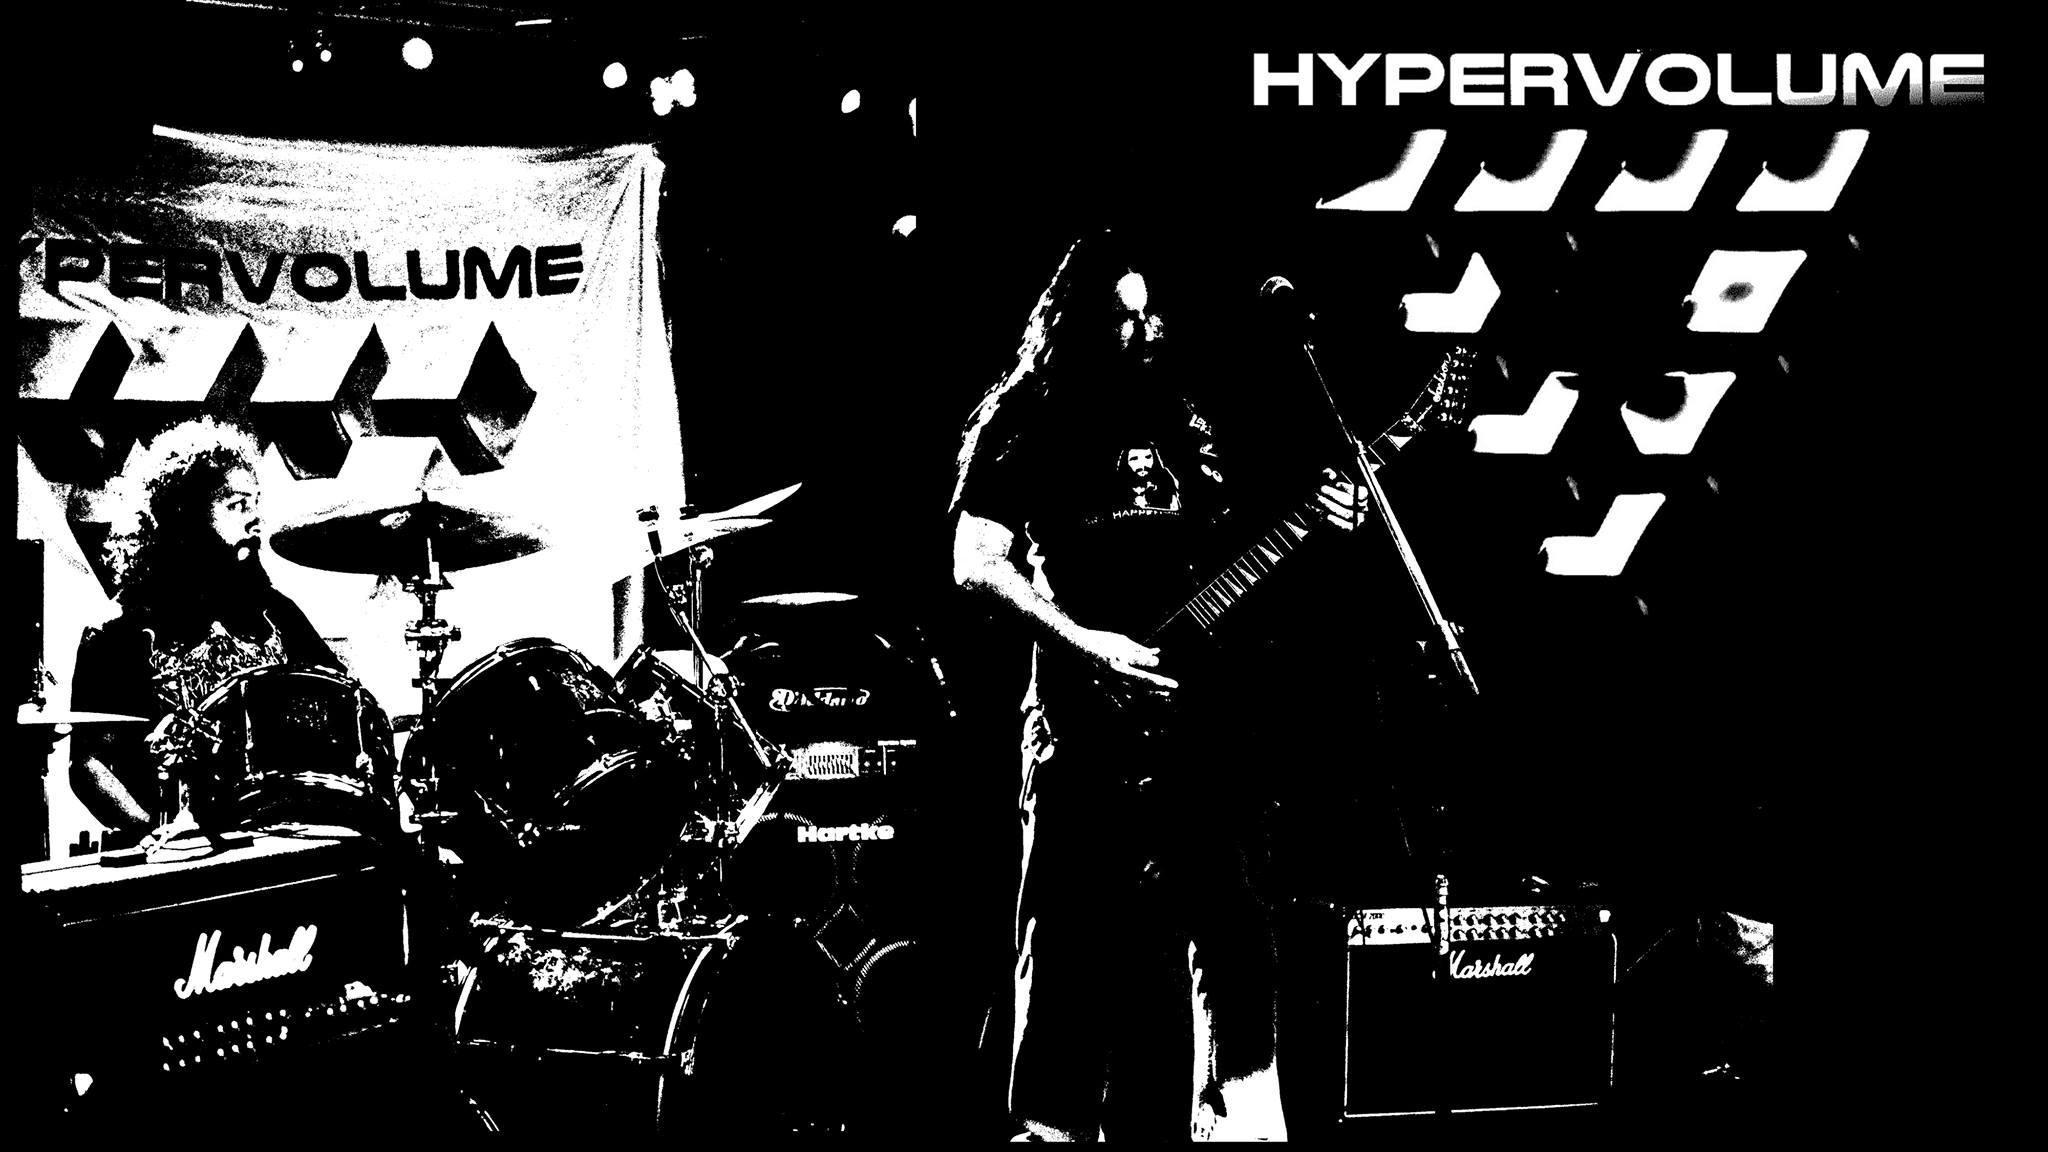 HYPERVOLUME picture